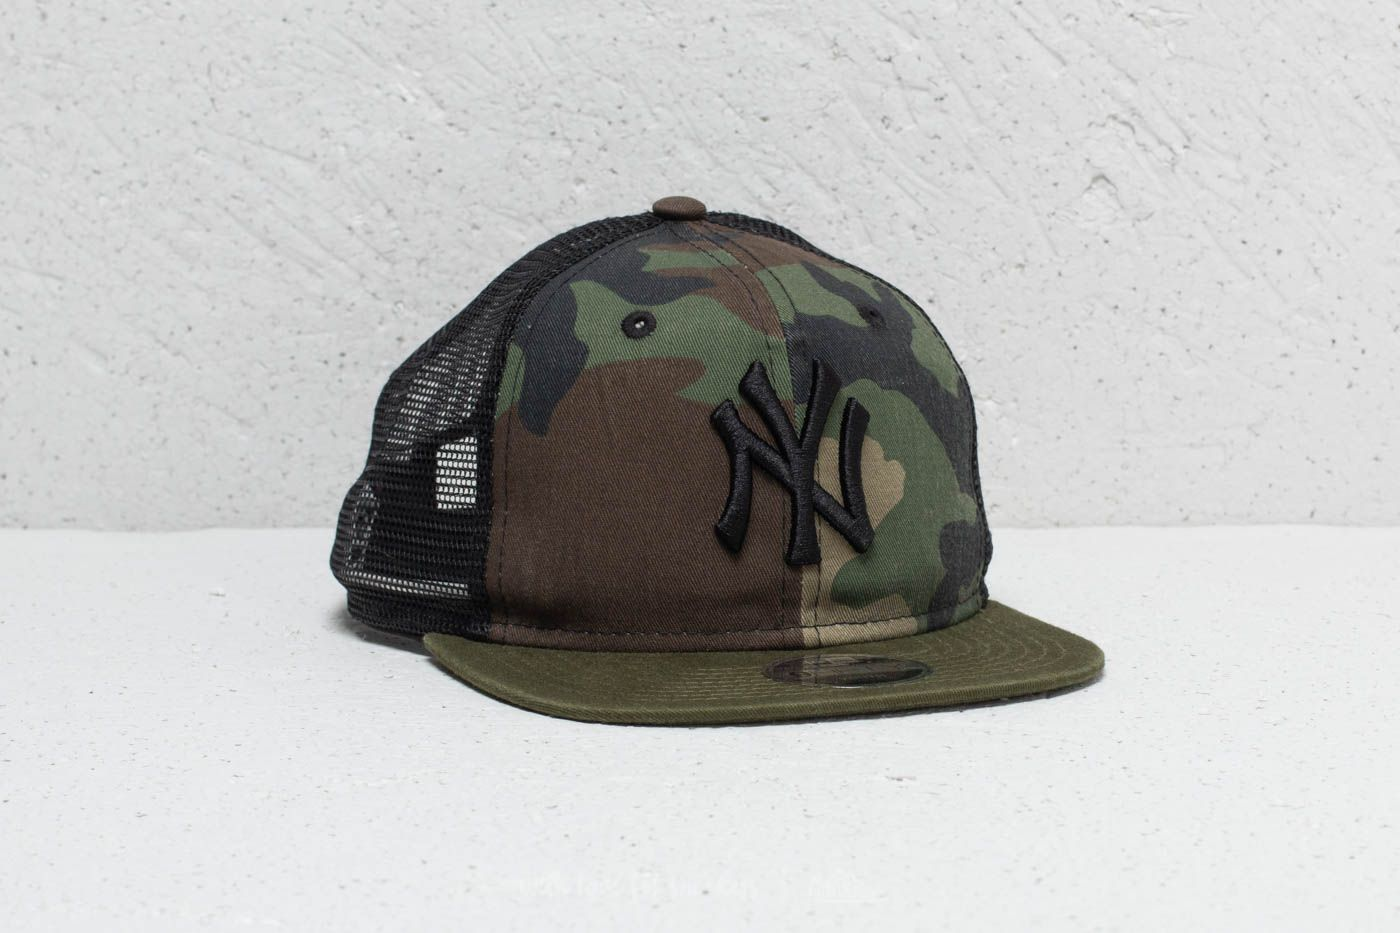 97f95f39c2783 New Era 9Fifty Youth MLB New York Yankees Trucker Washed Camo ...